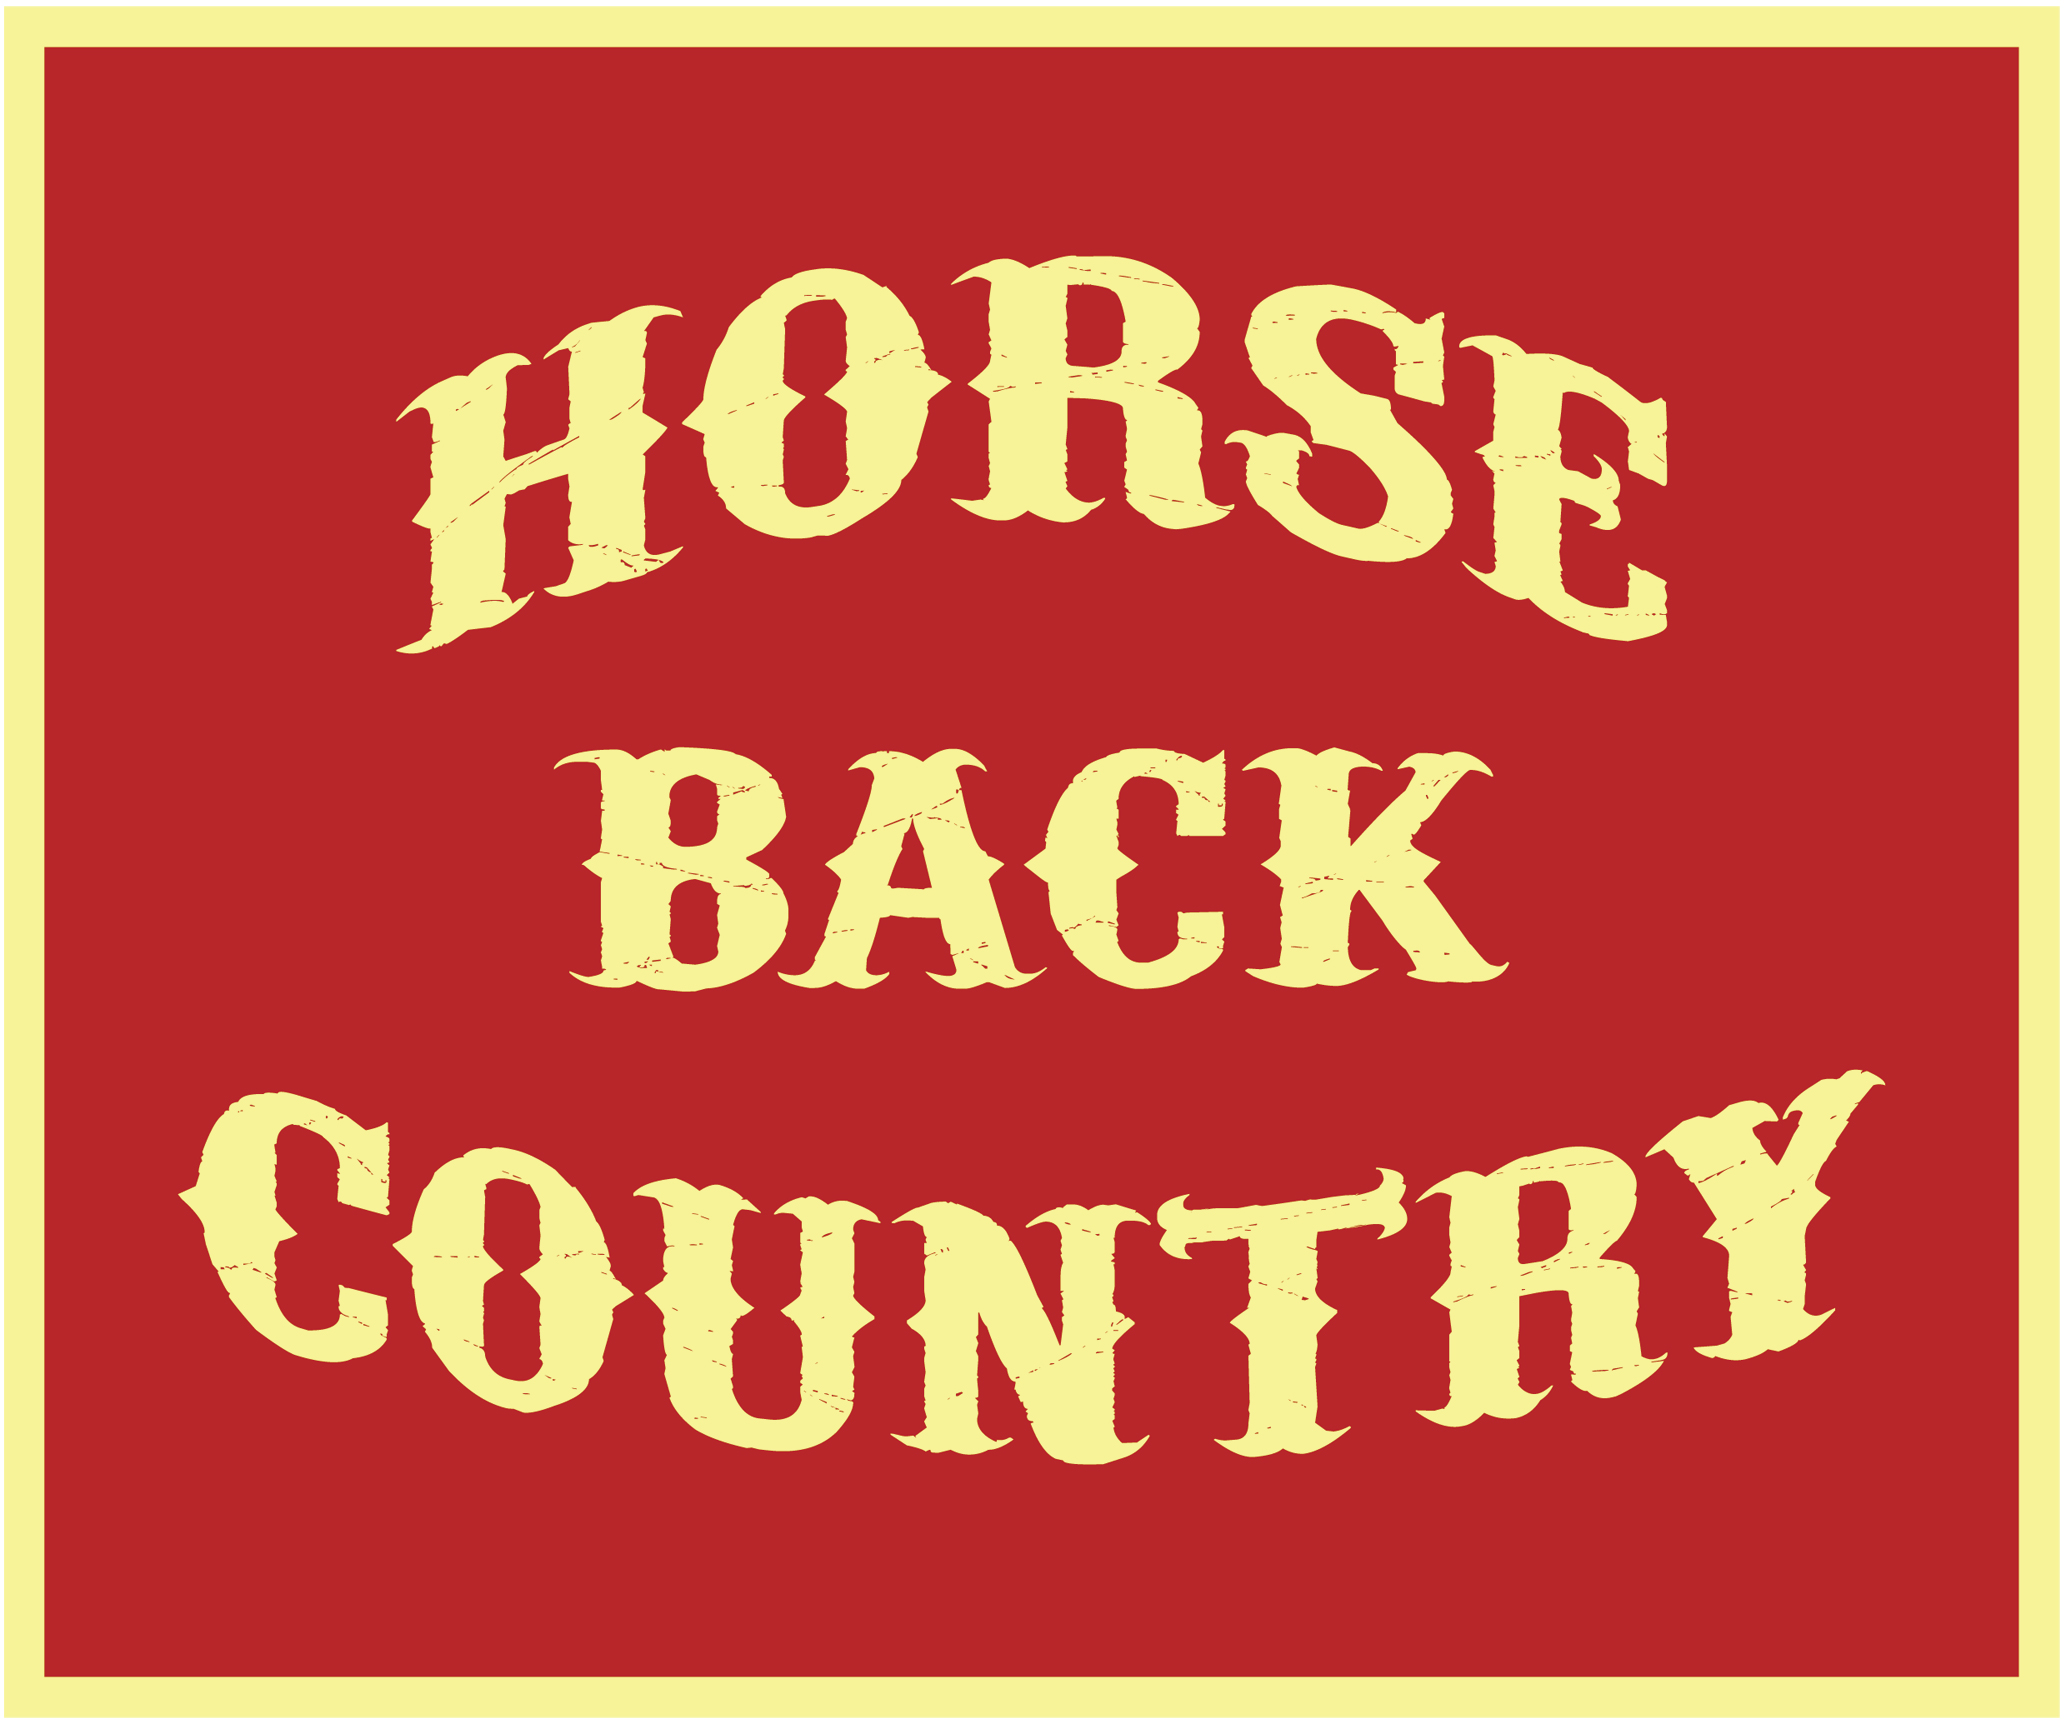 Horse back country|ニセコ来たら乗馬!自然の中をホーストレッキング